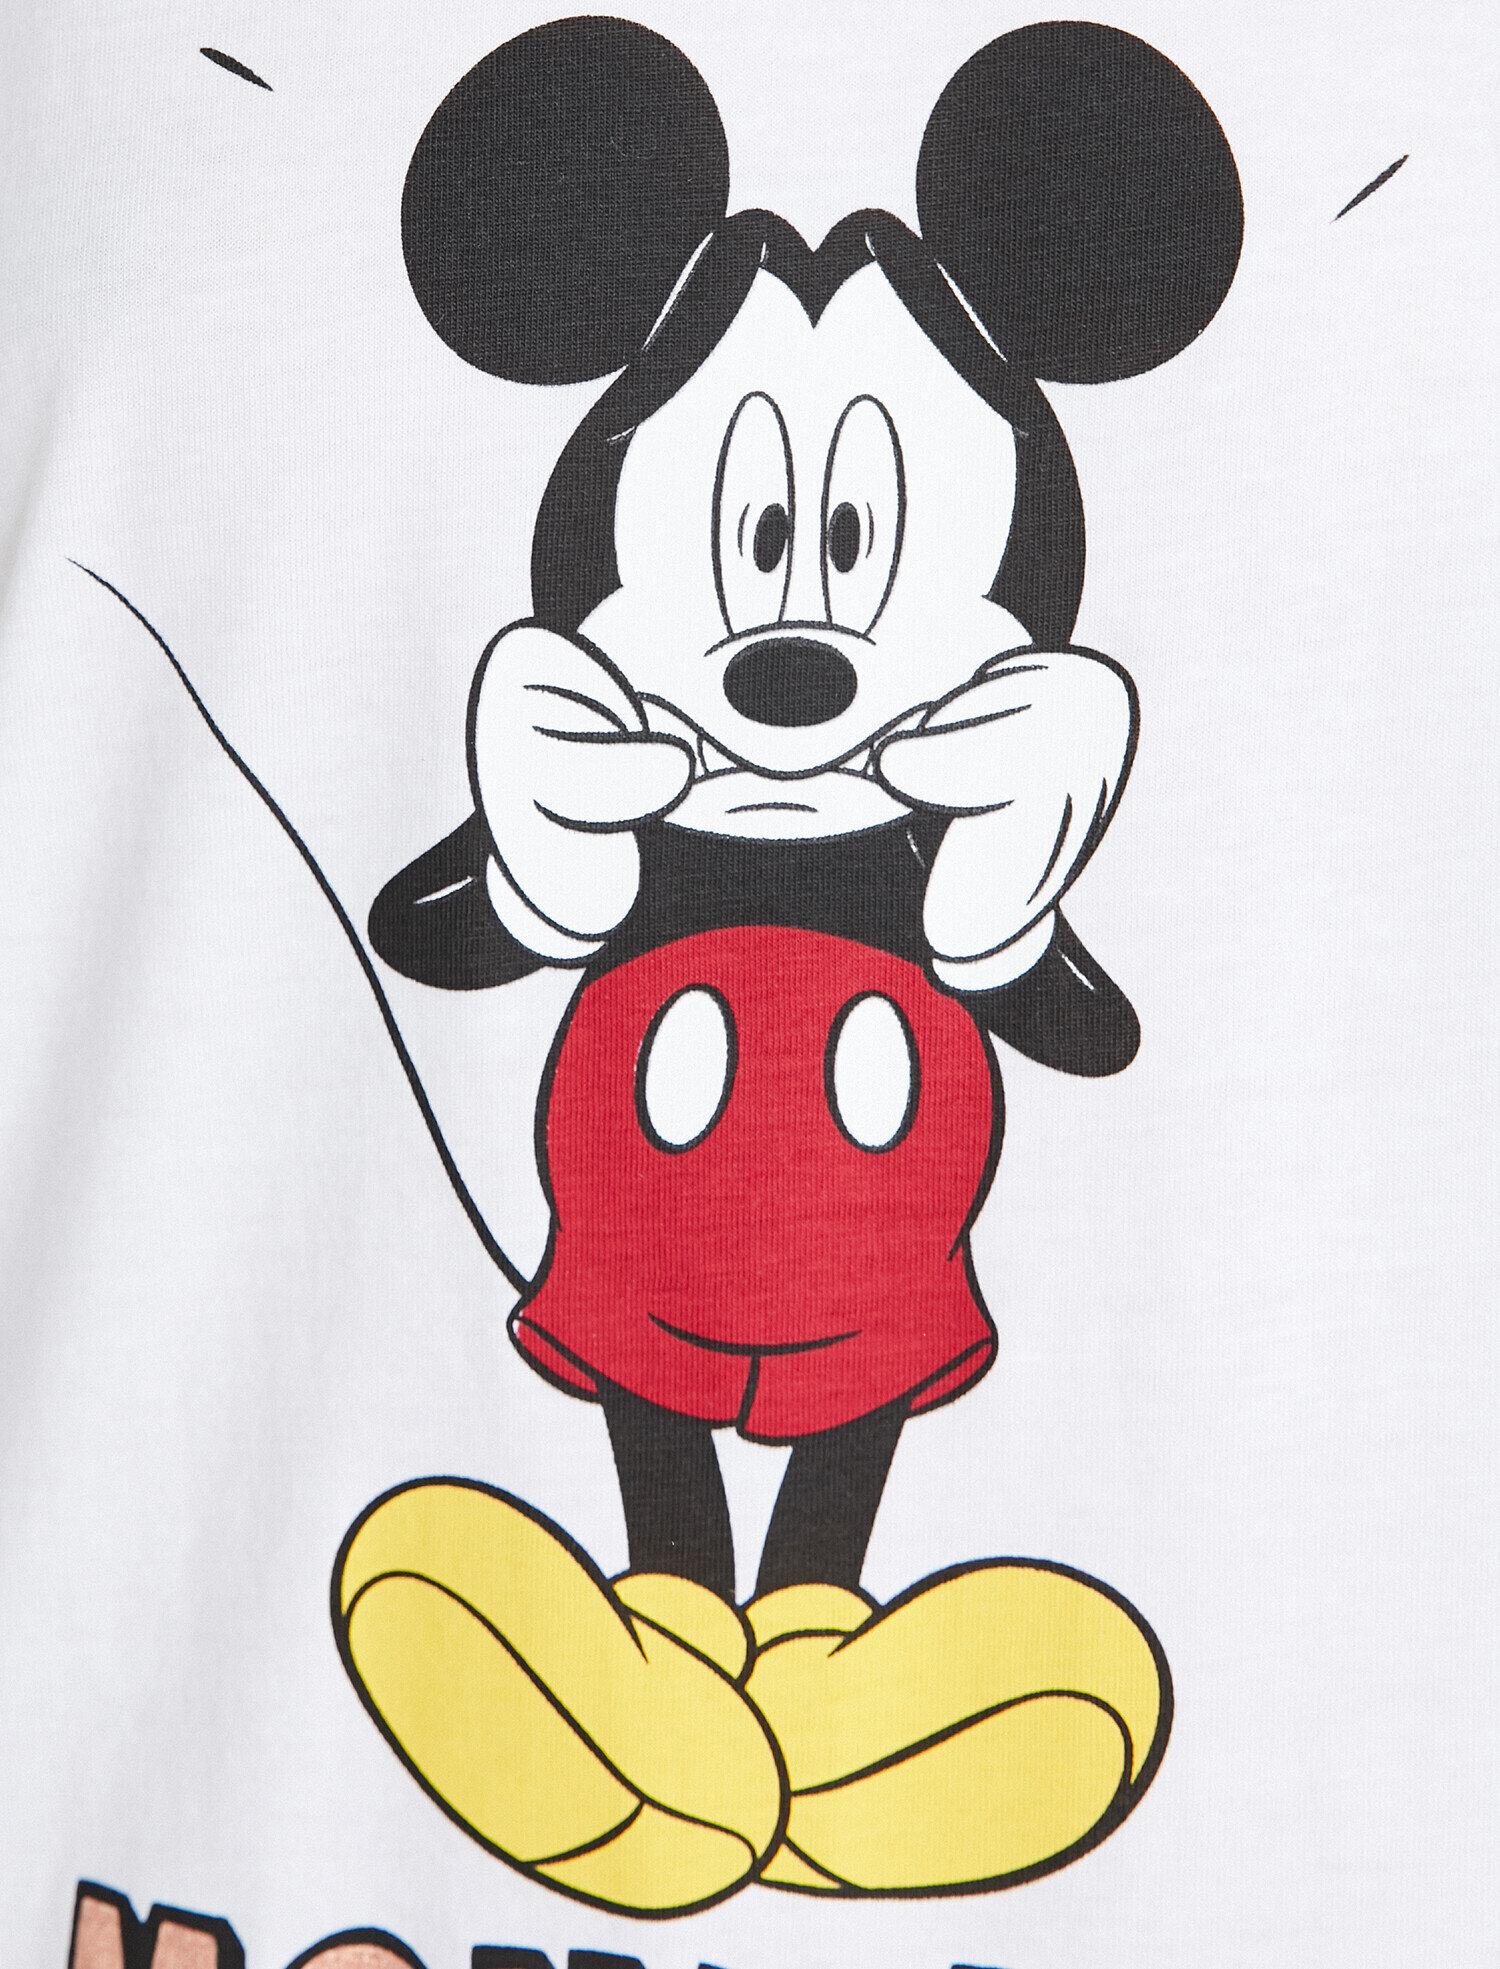 Red Women Mickey Mouse Licensed Printed Pyjama Sets 9klk79108mk12u